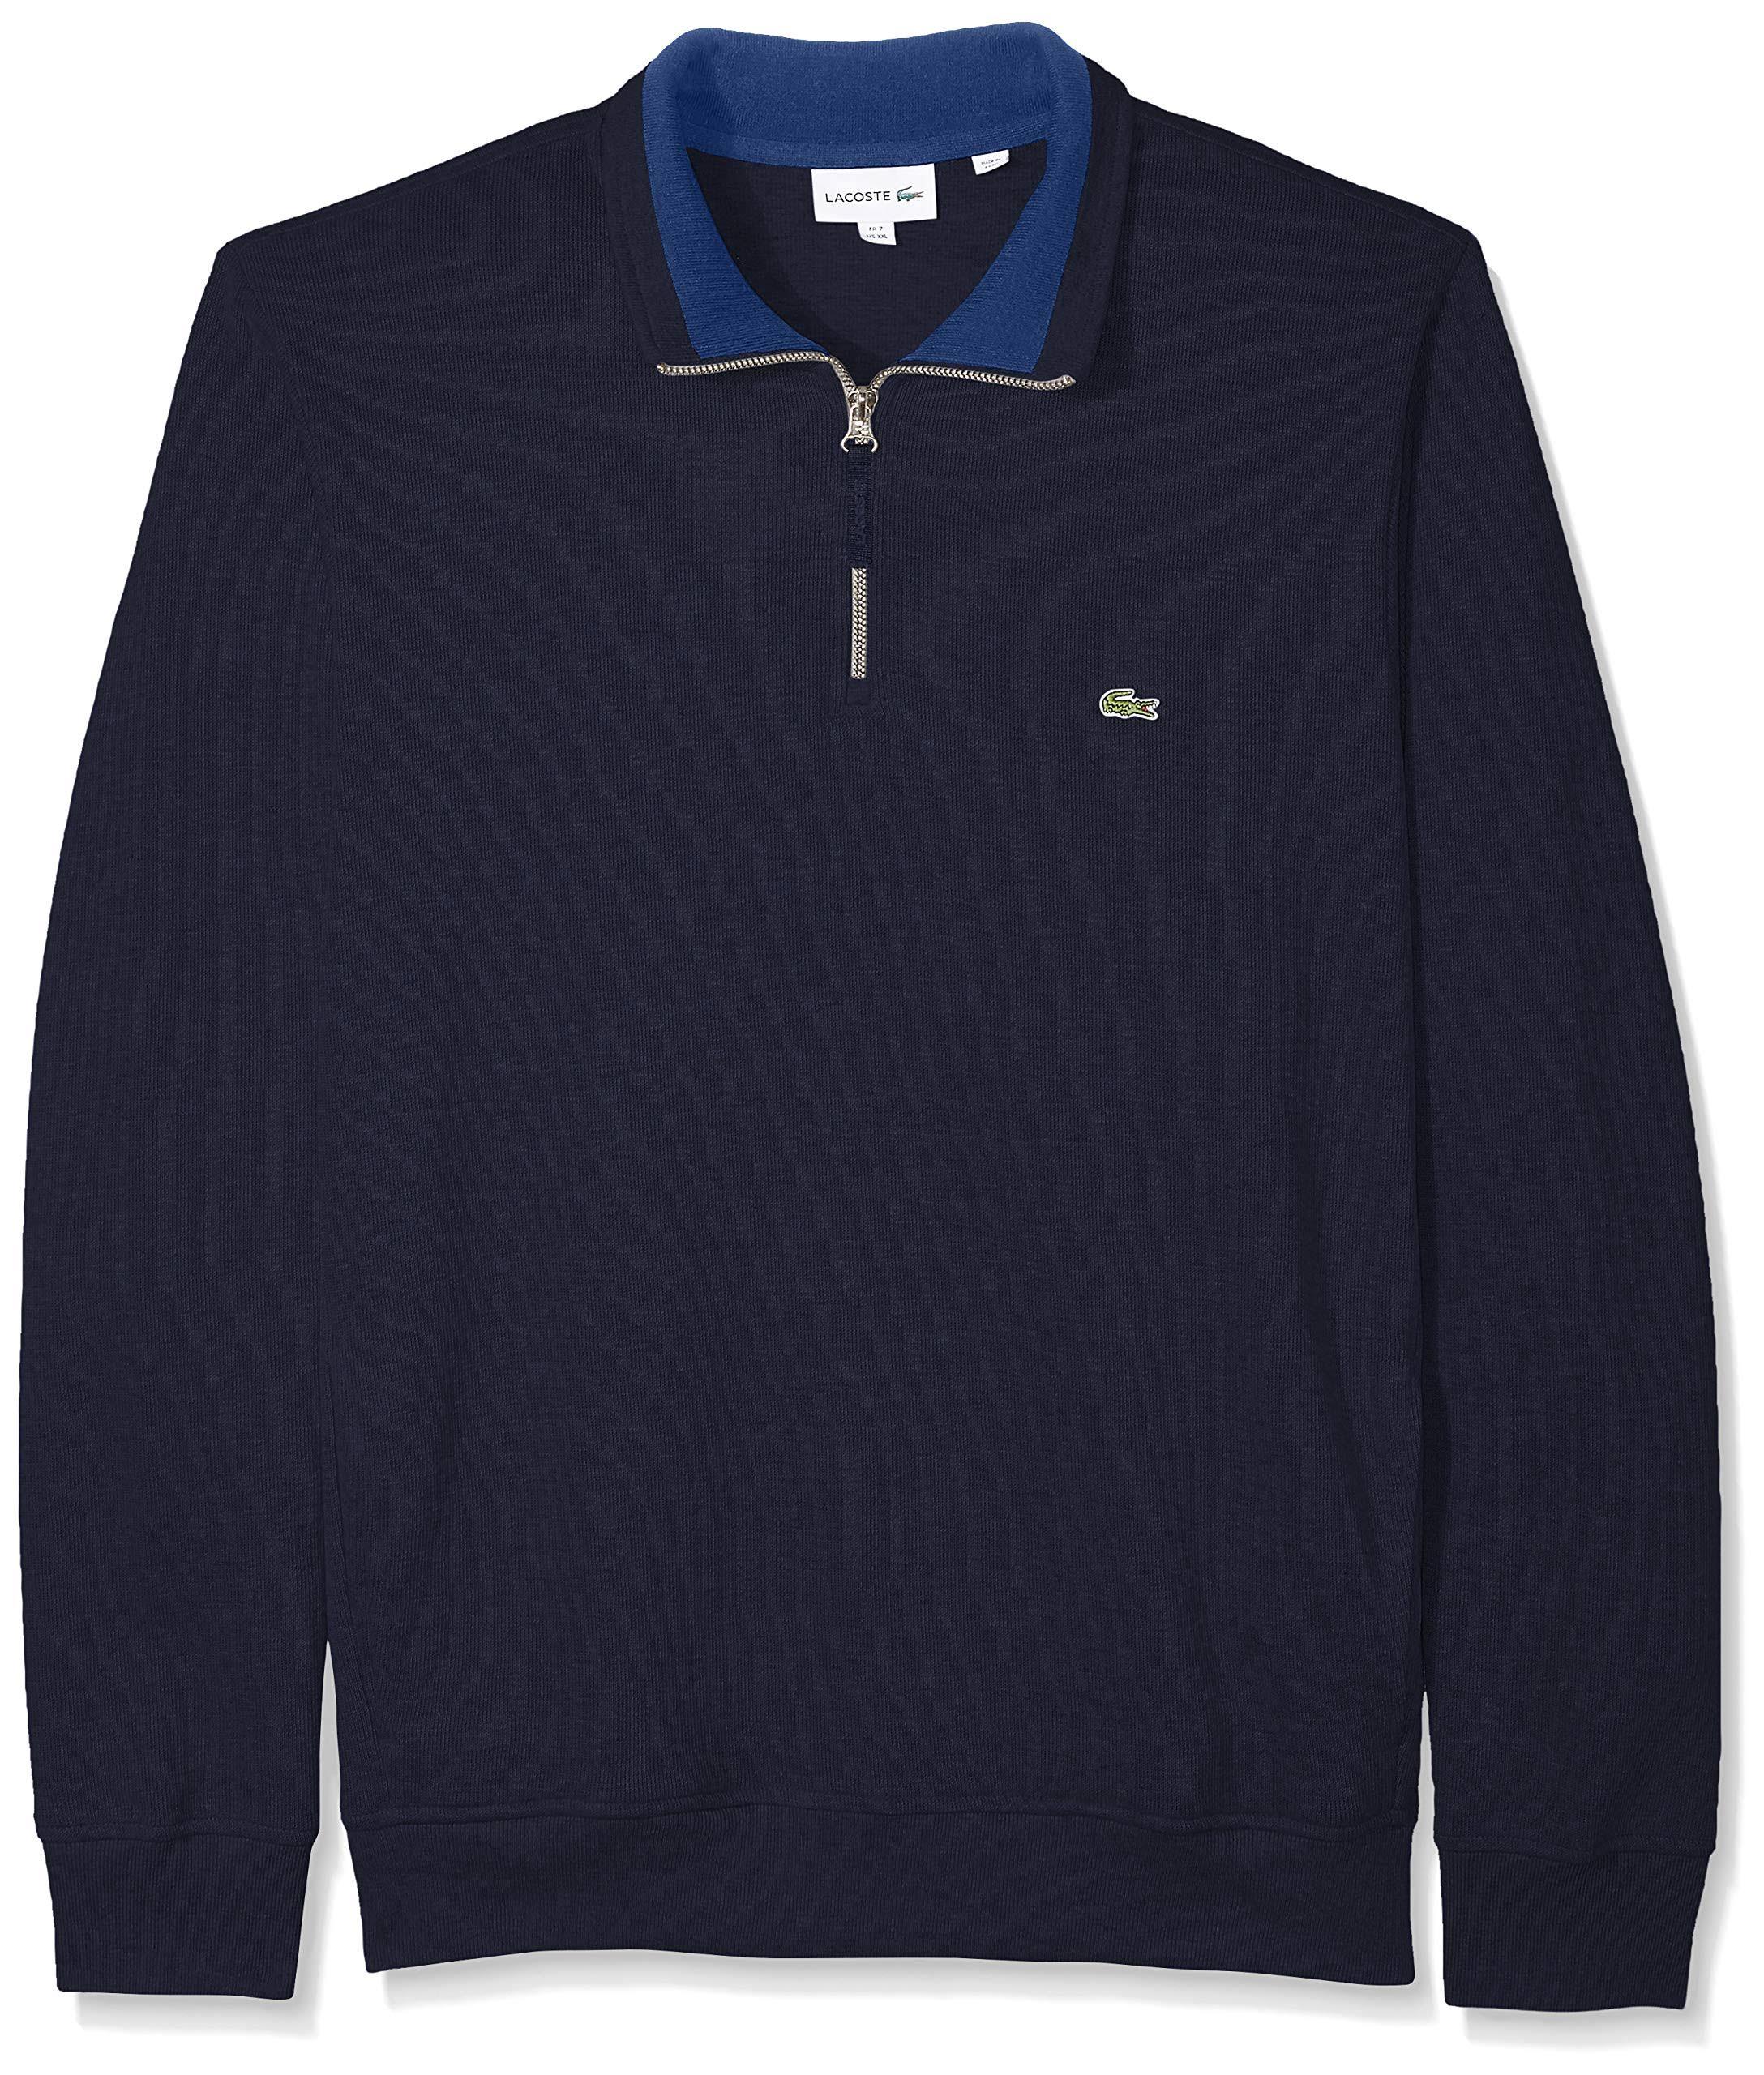 Tintero Larga Fancy Sweatshirt Hombres Semi Estándar Azul Marino Front Lacoste Manga Zip UqxBw7StPt